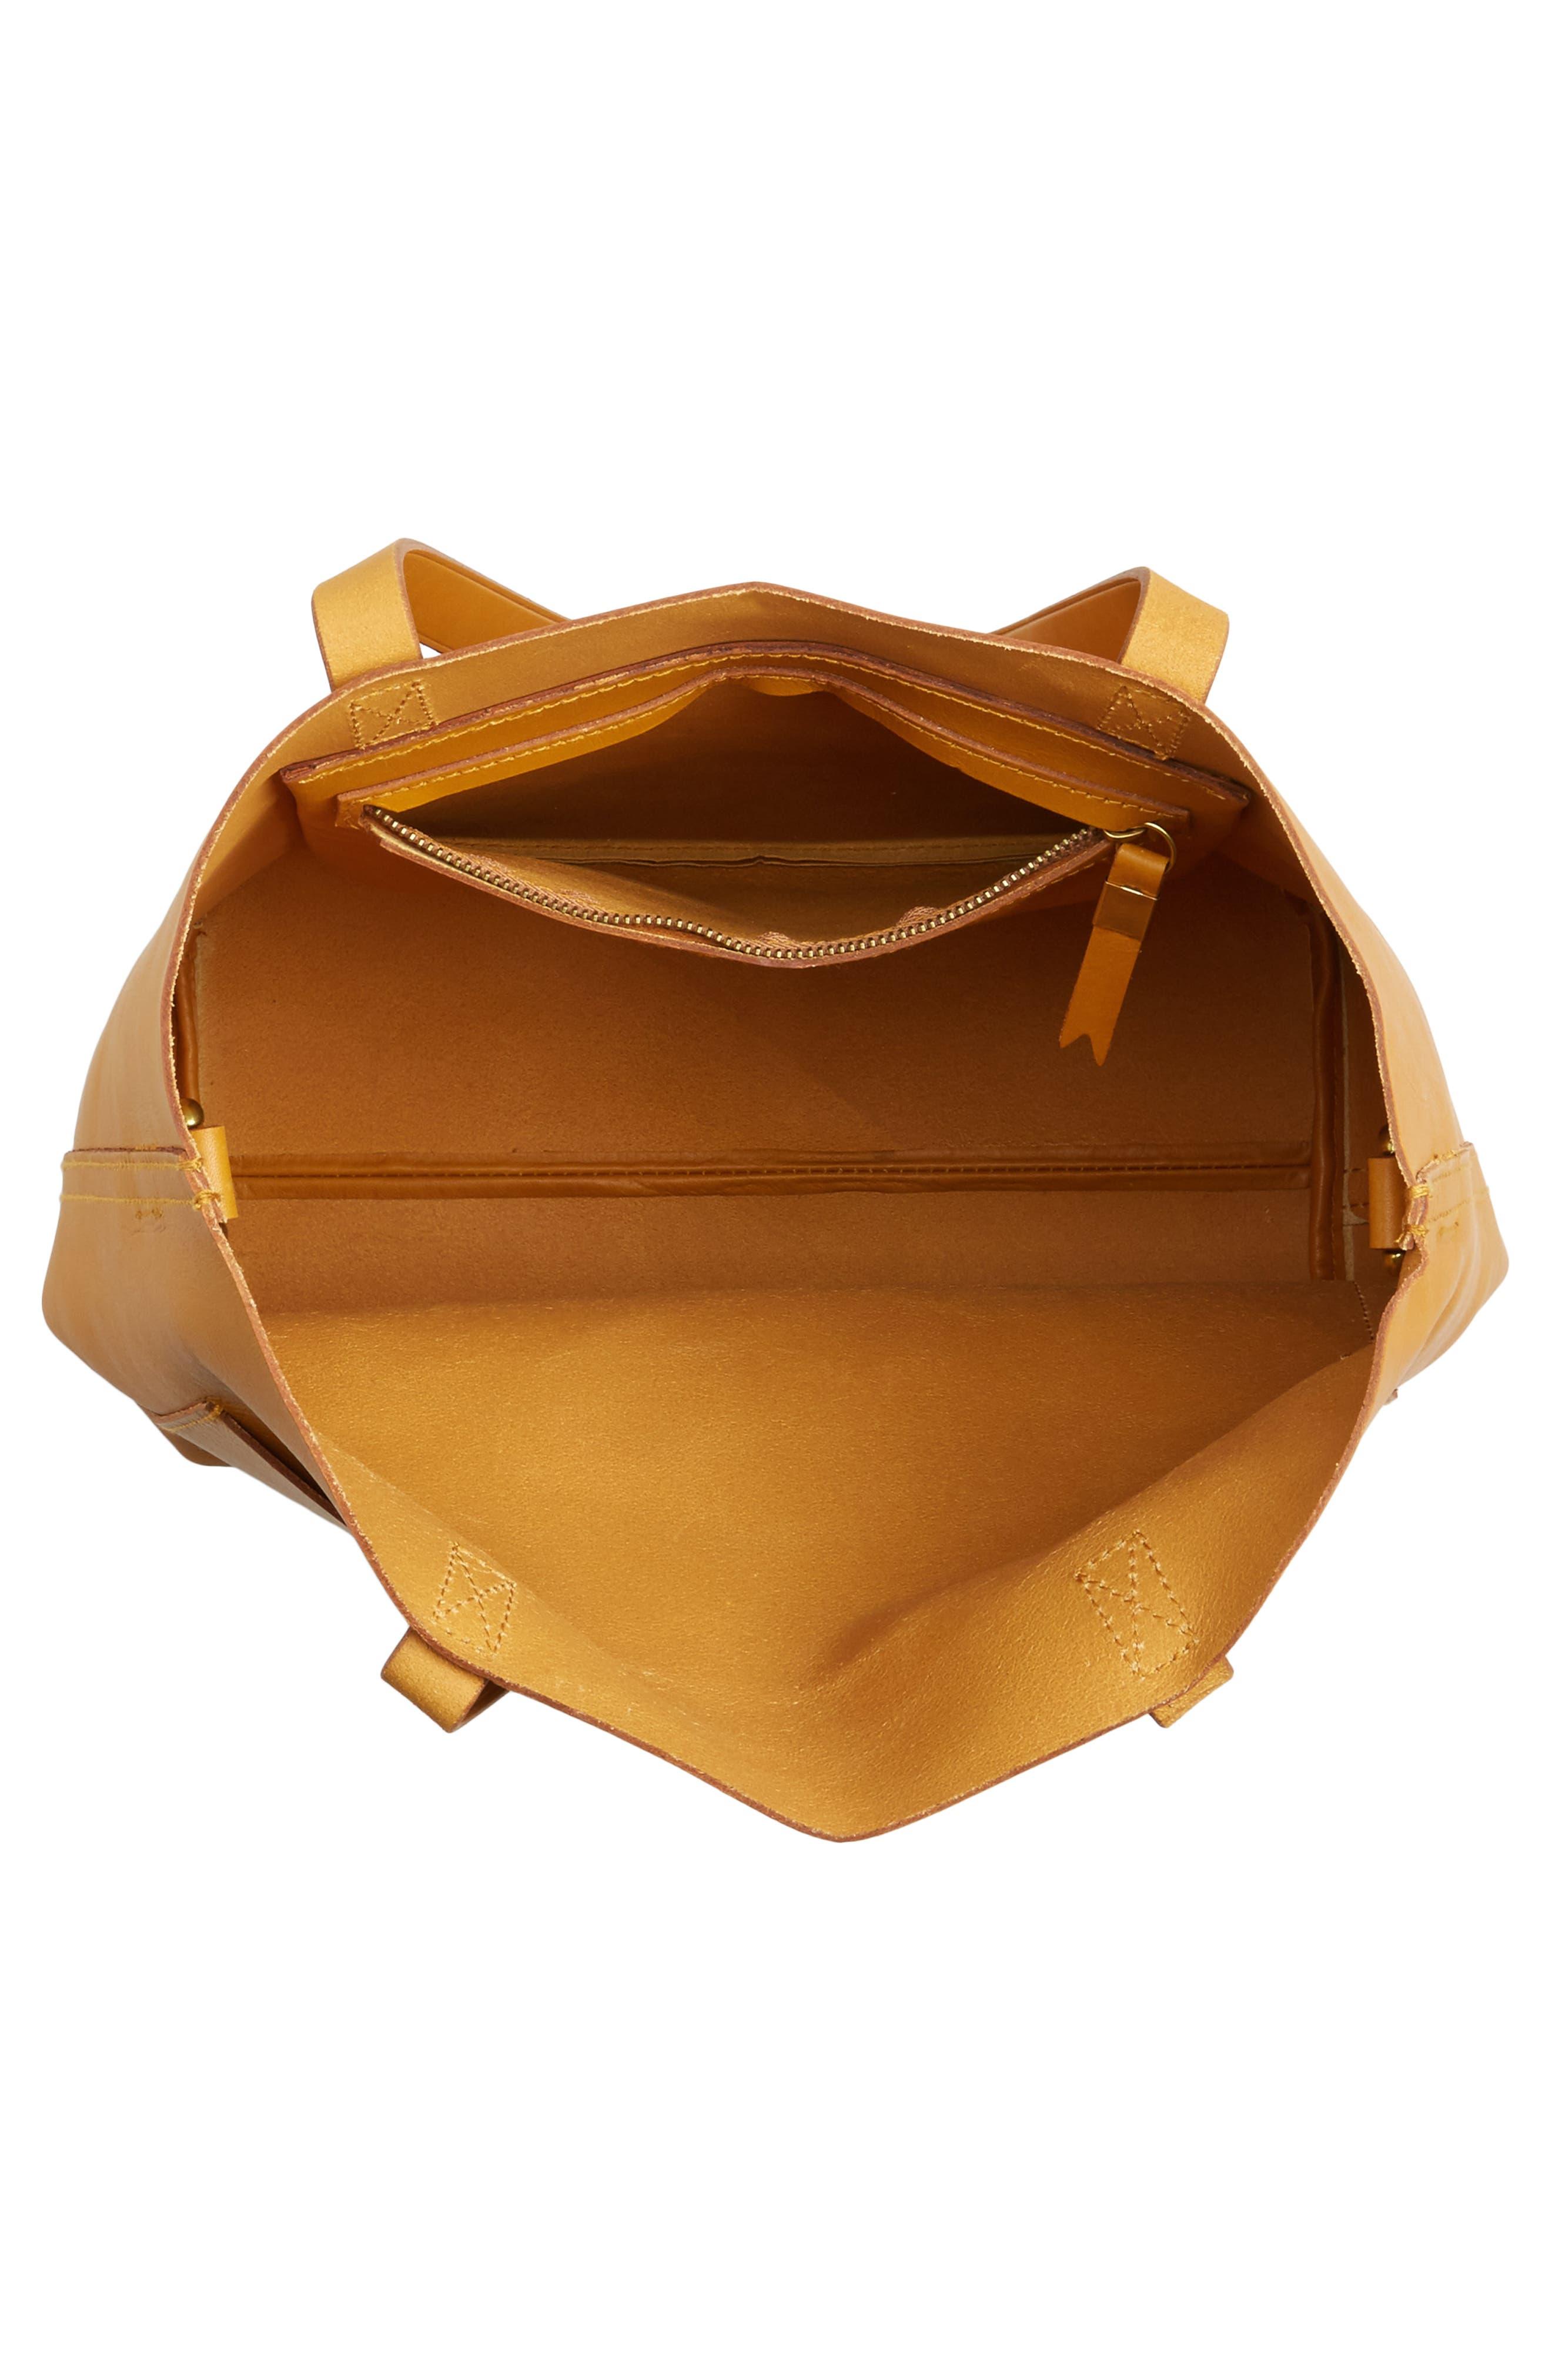 Medium Leather Transport Tote,                             Alternate thumbnail 4, color,                             250